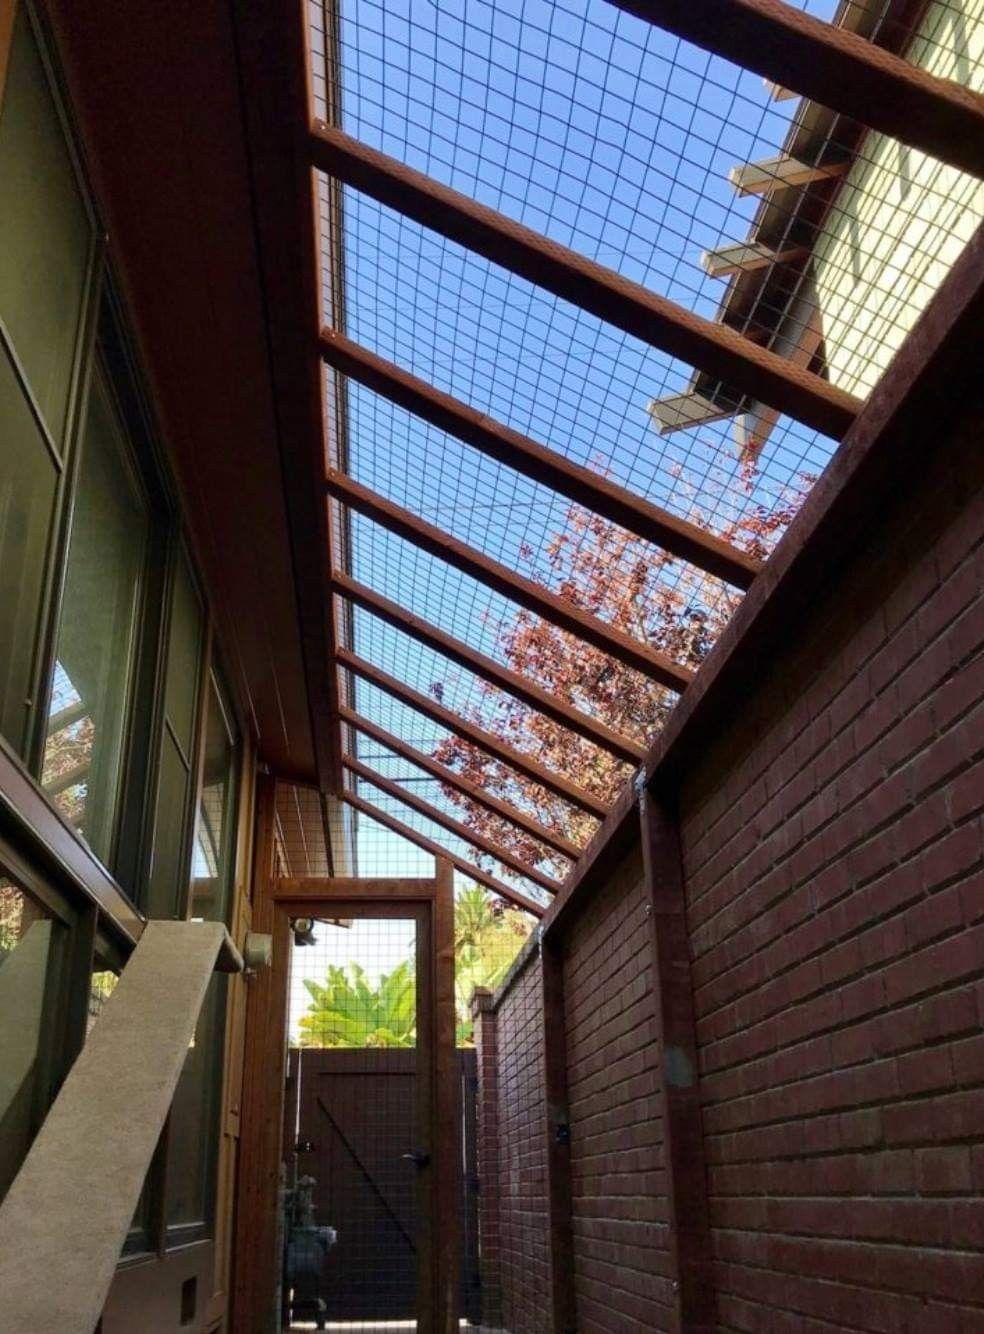 Pin By Crystal Bailon On Dogs Cat Patio Diy Cat Enclosure Outdoor Cat Enclosure